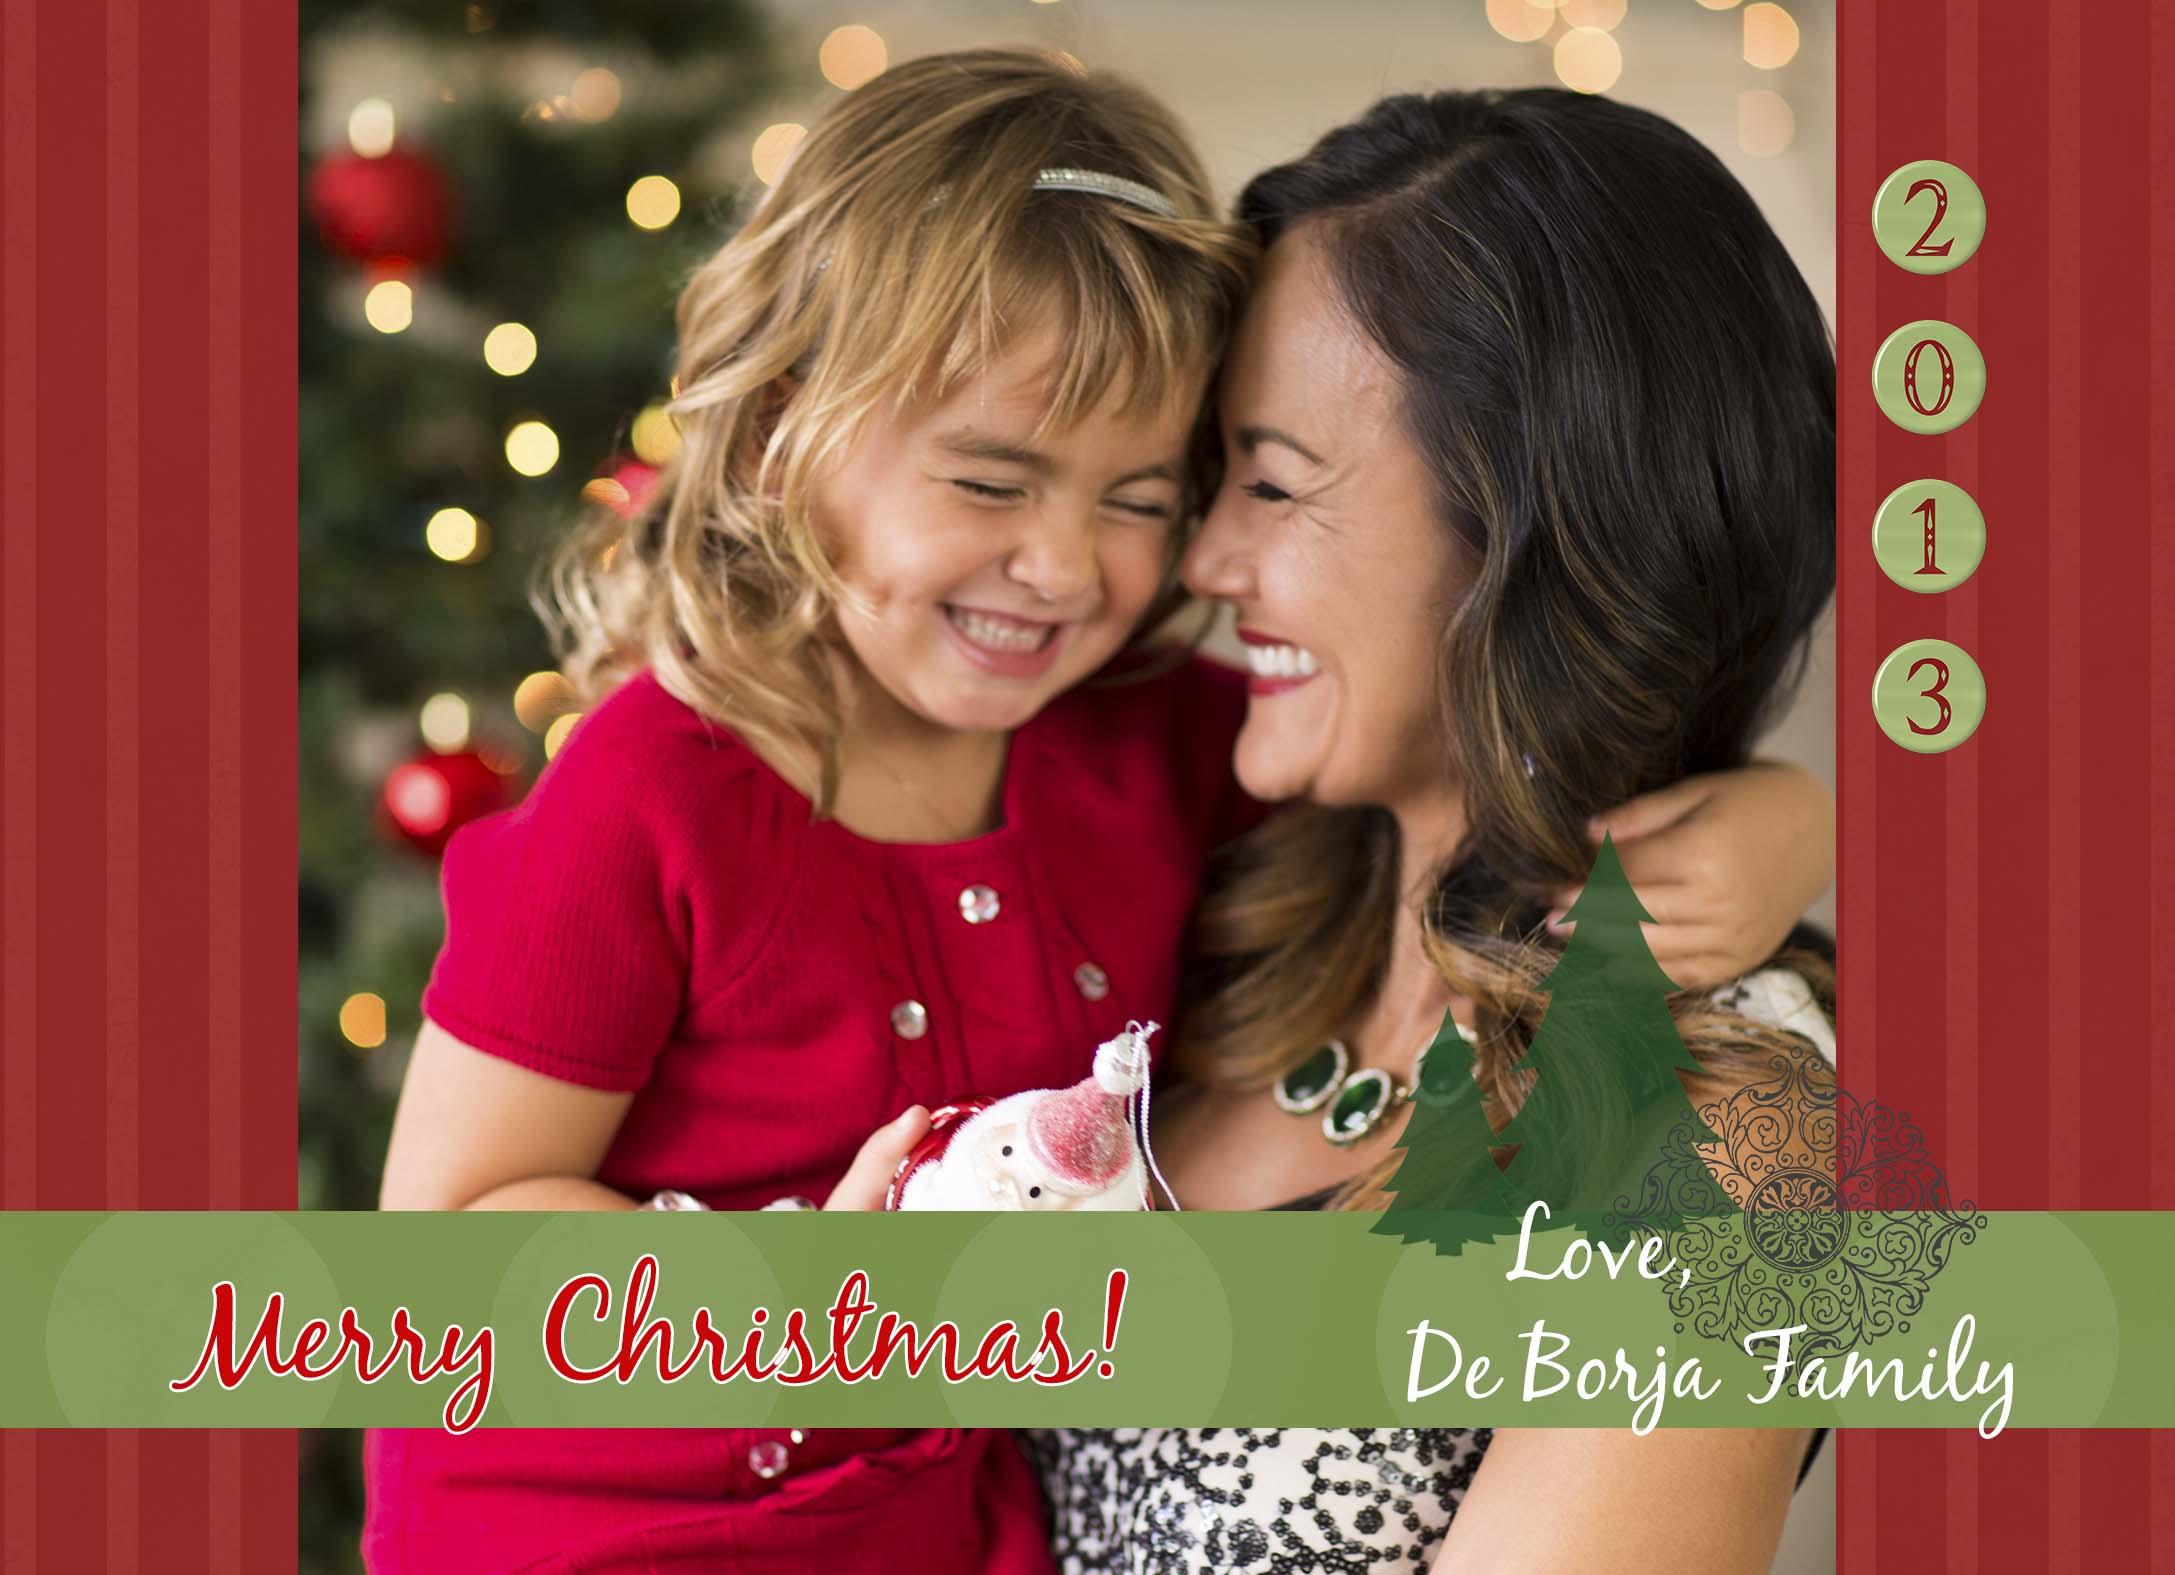 Christmas Card5 Front.jpg